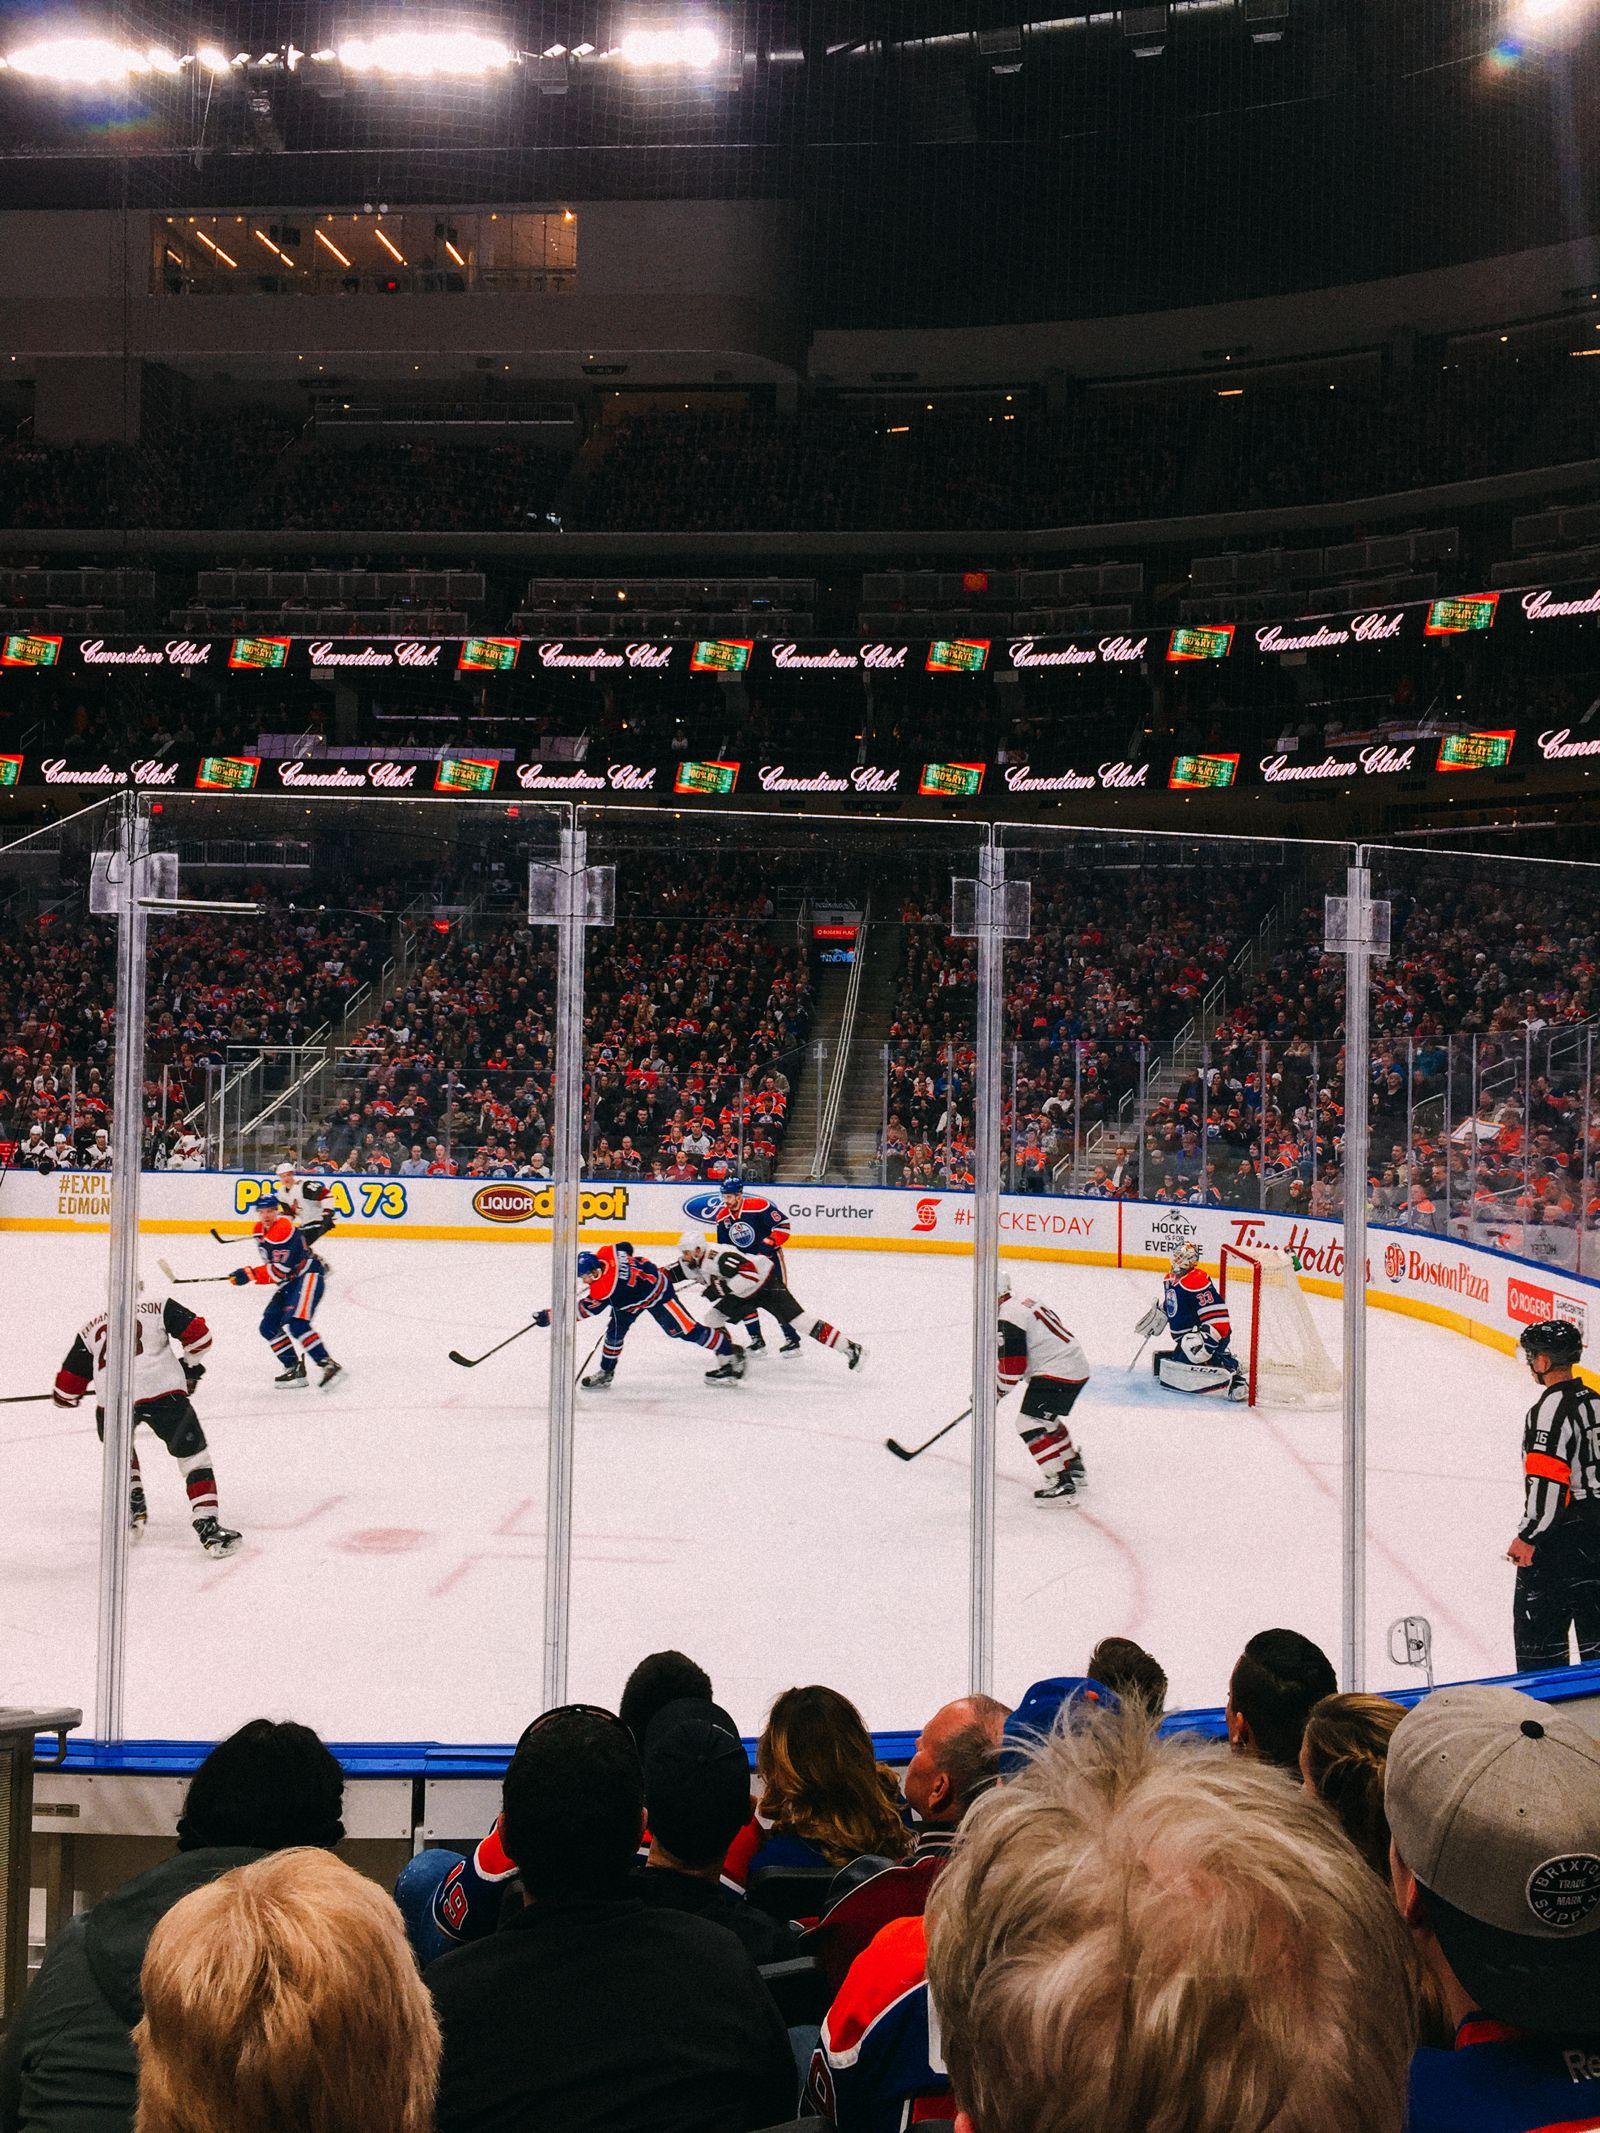 Dog Sledding In Jasper And Ice Hockey In Edmonton - 2 Canadian 'Must-Do's! (71)